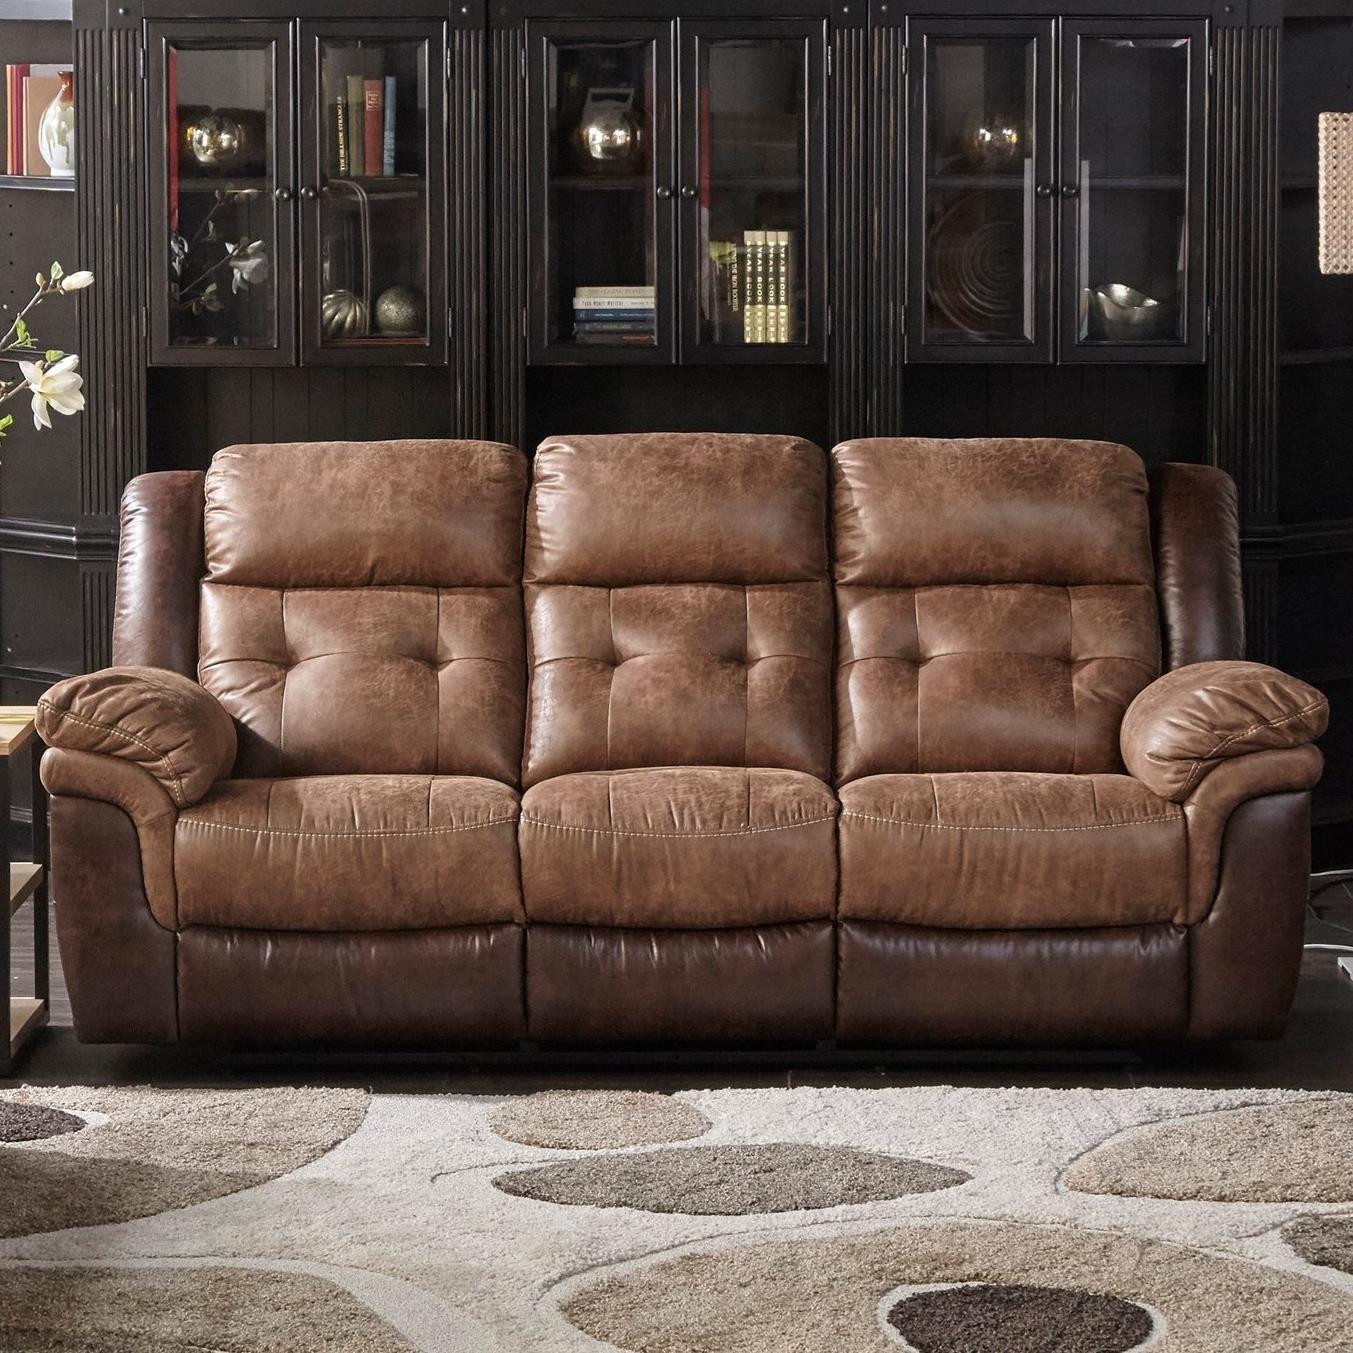 reclining sofa manufacturers usa nina alex express xw5156m l3 2m